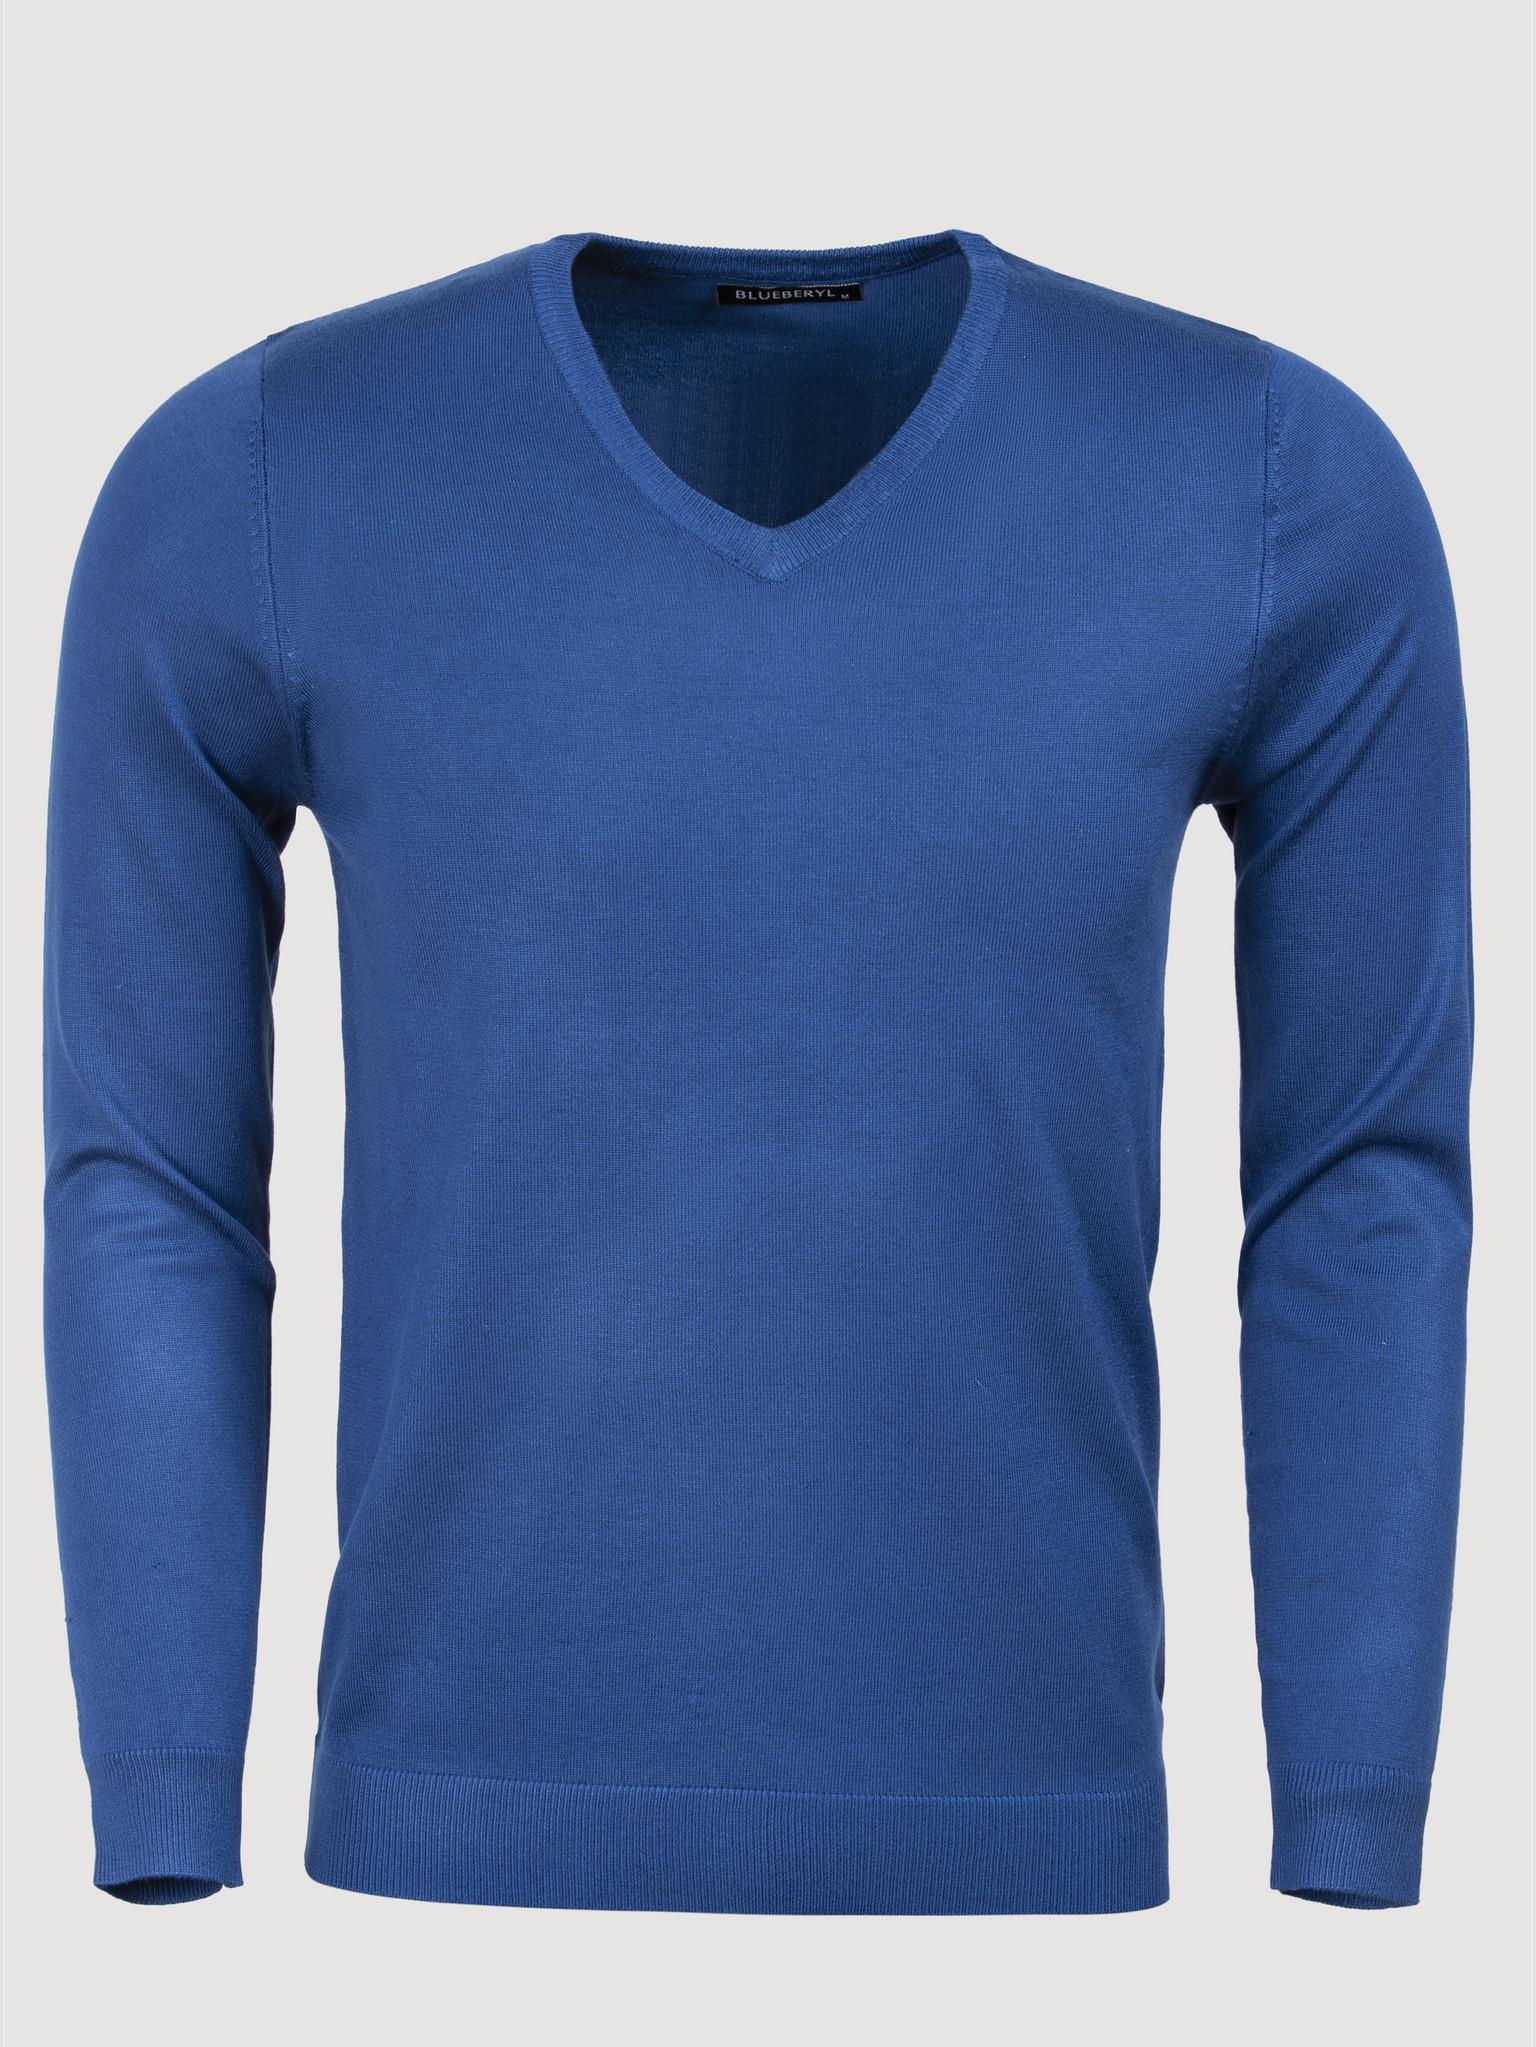 Blueberyl Sweater BK21 Maat: 2XL